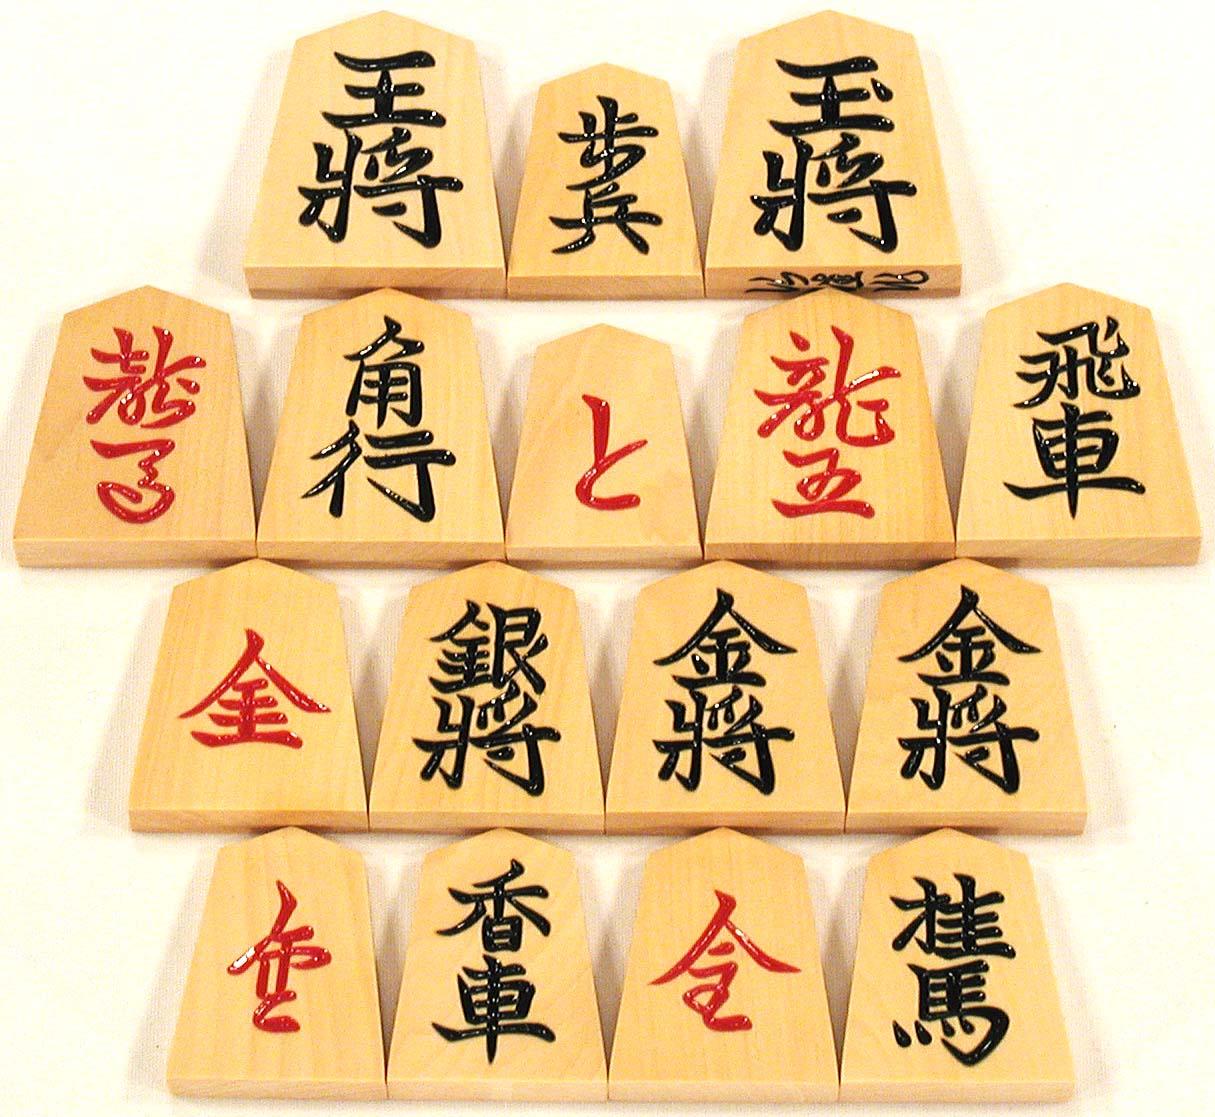 shogi pieceshorigomaquot tsuge quot boxwood aoyama